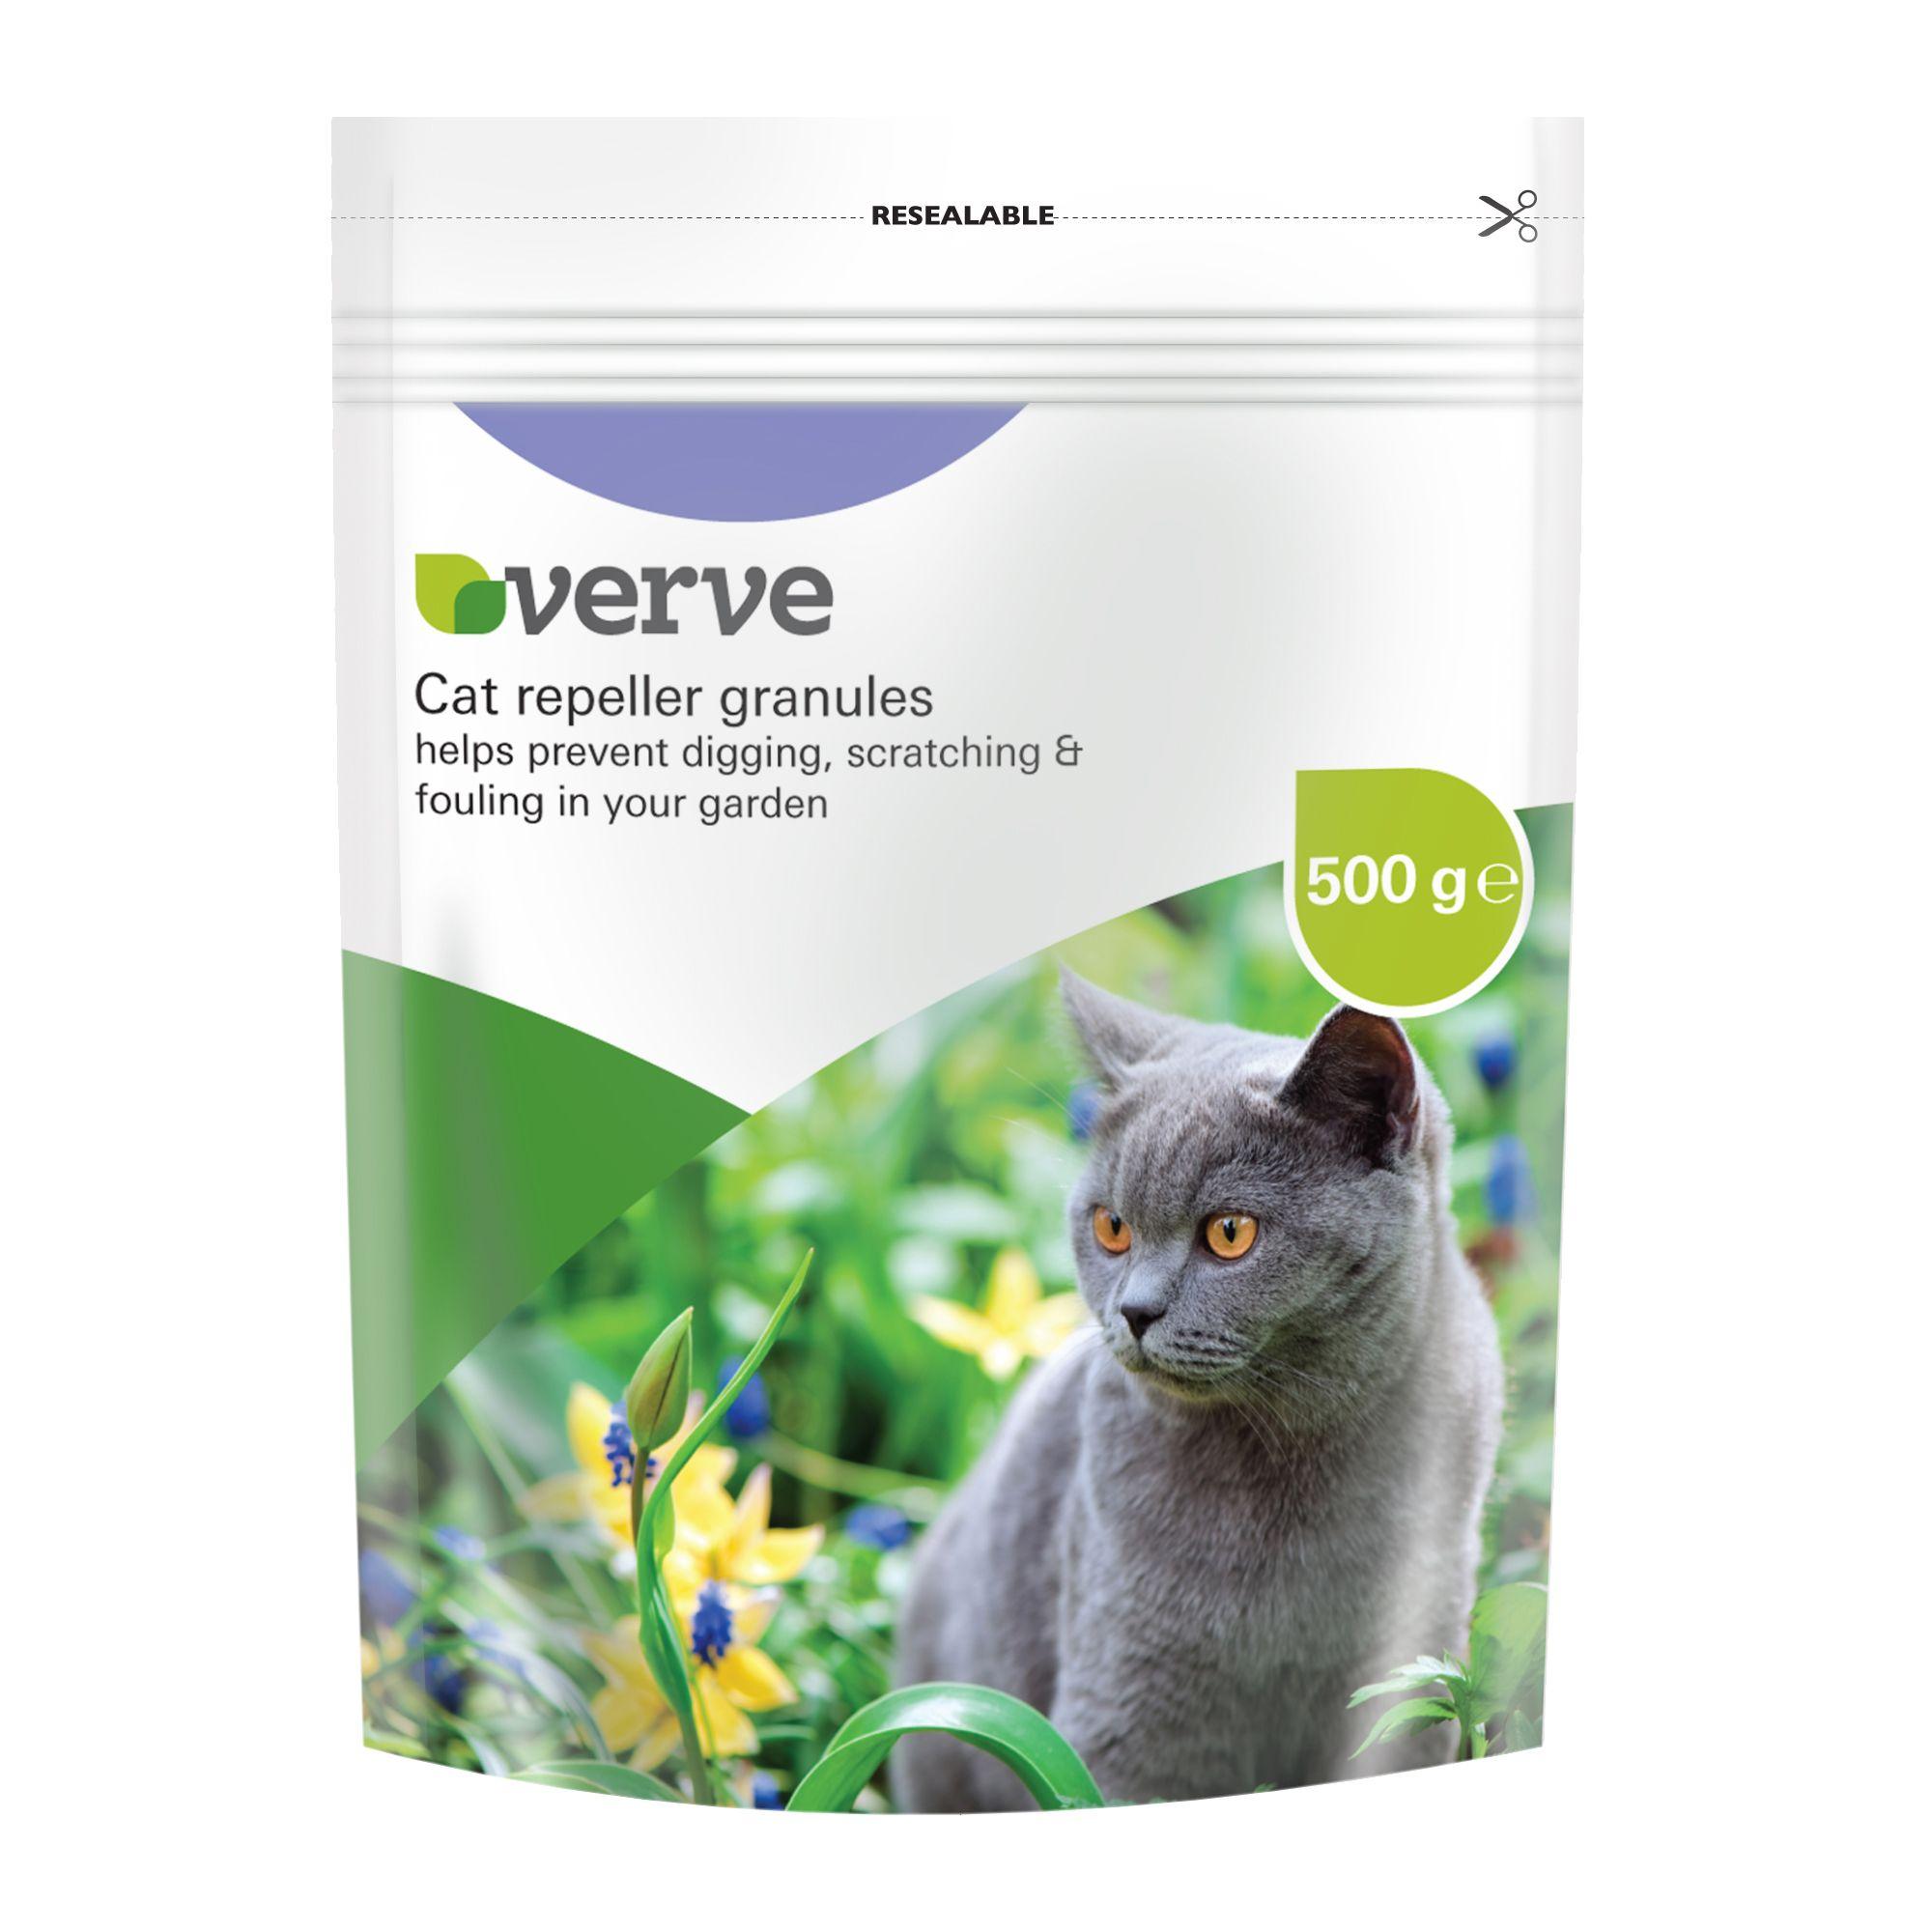 Spray Kitchen Cabinets Verve Cat Repellent Granules Departments Diy At B Amp Q